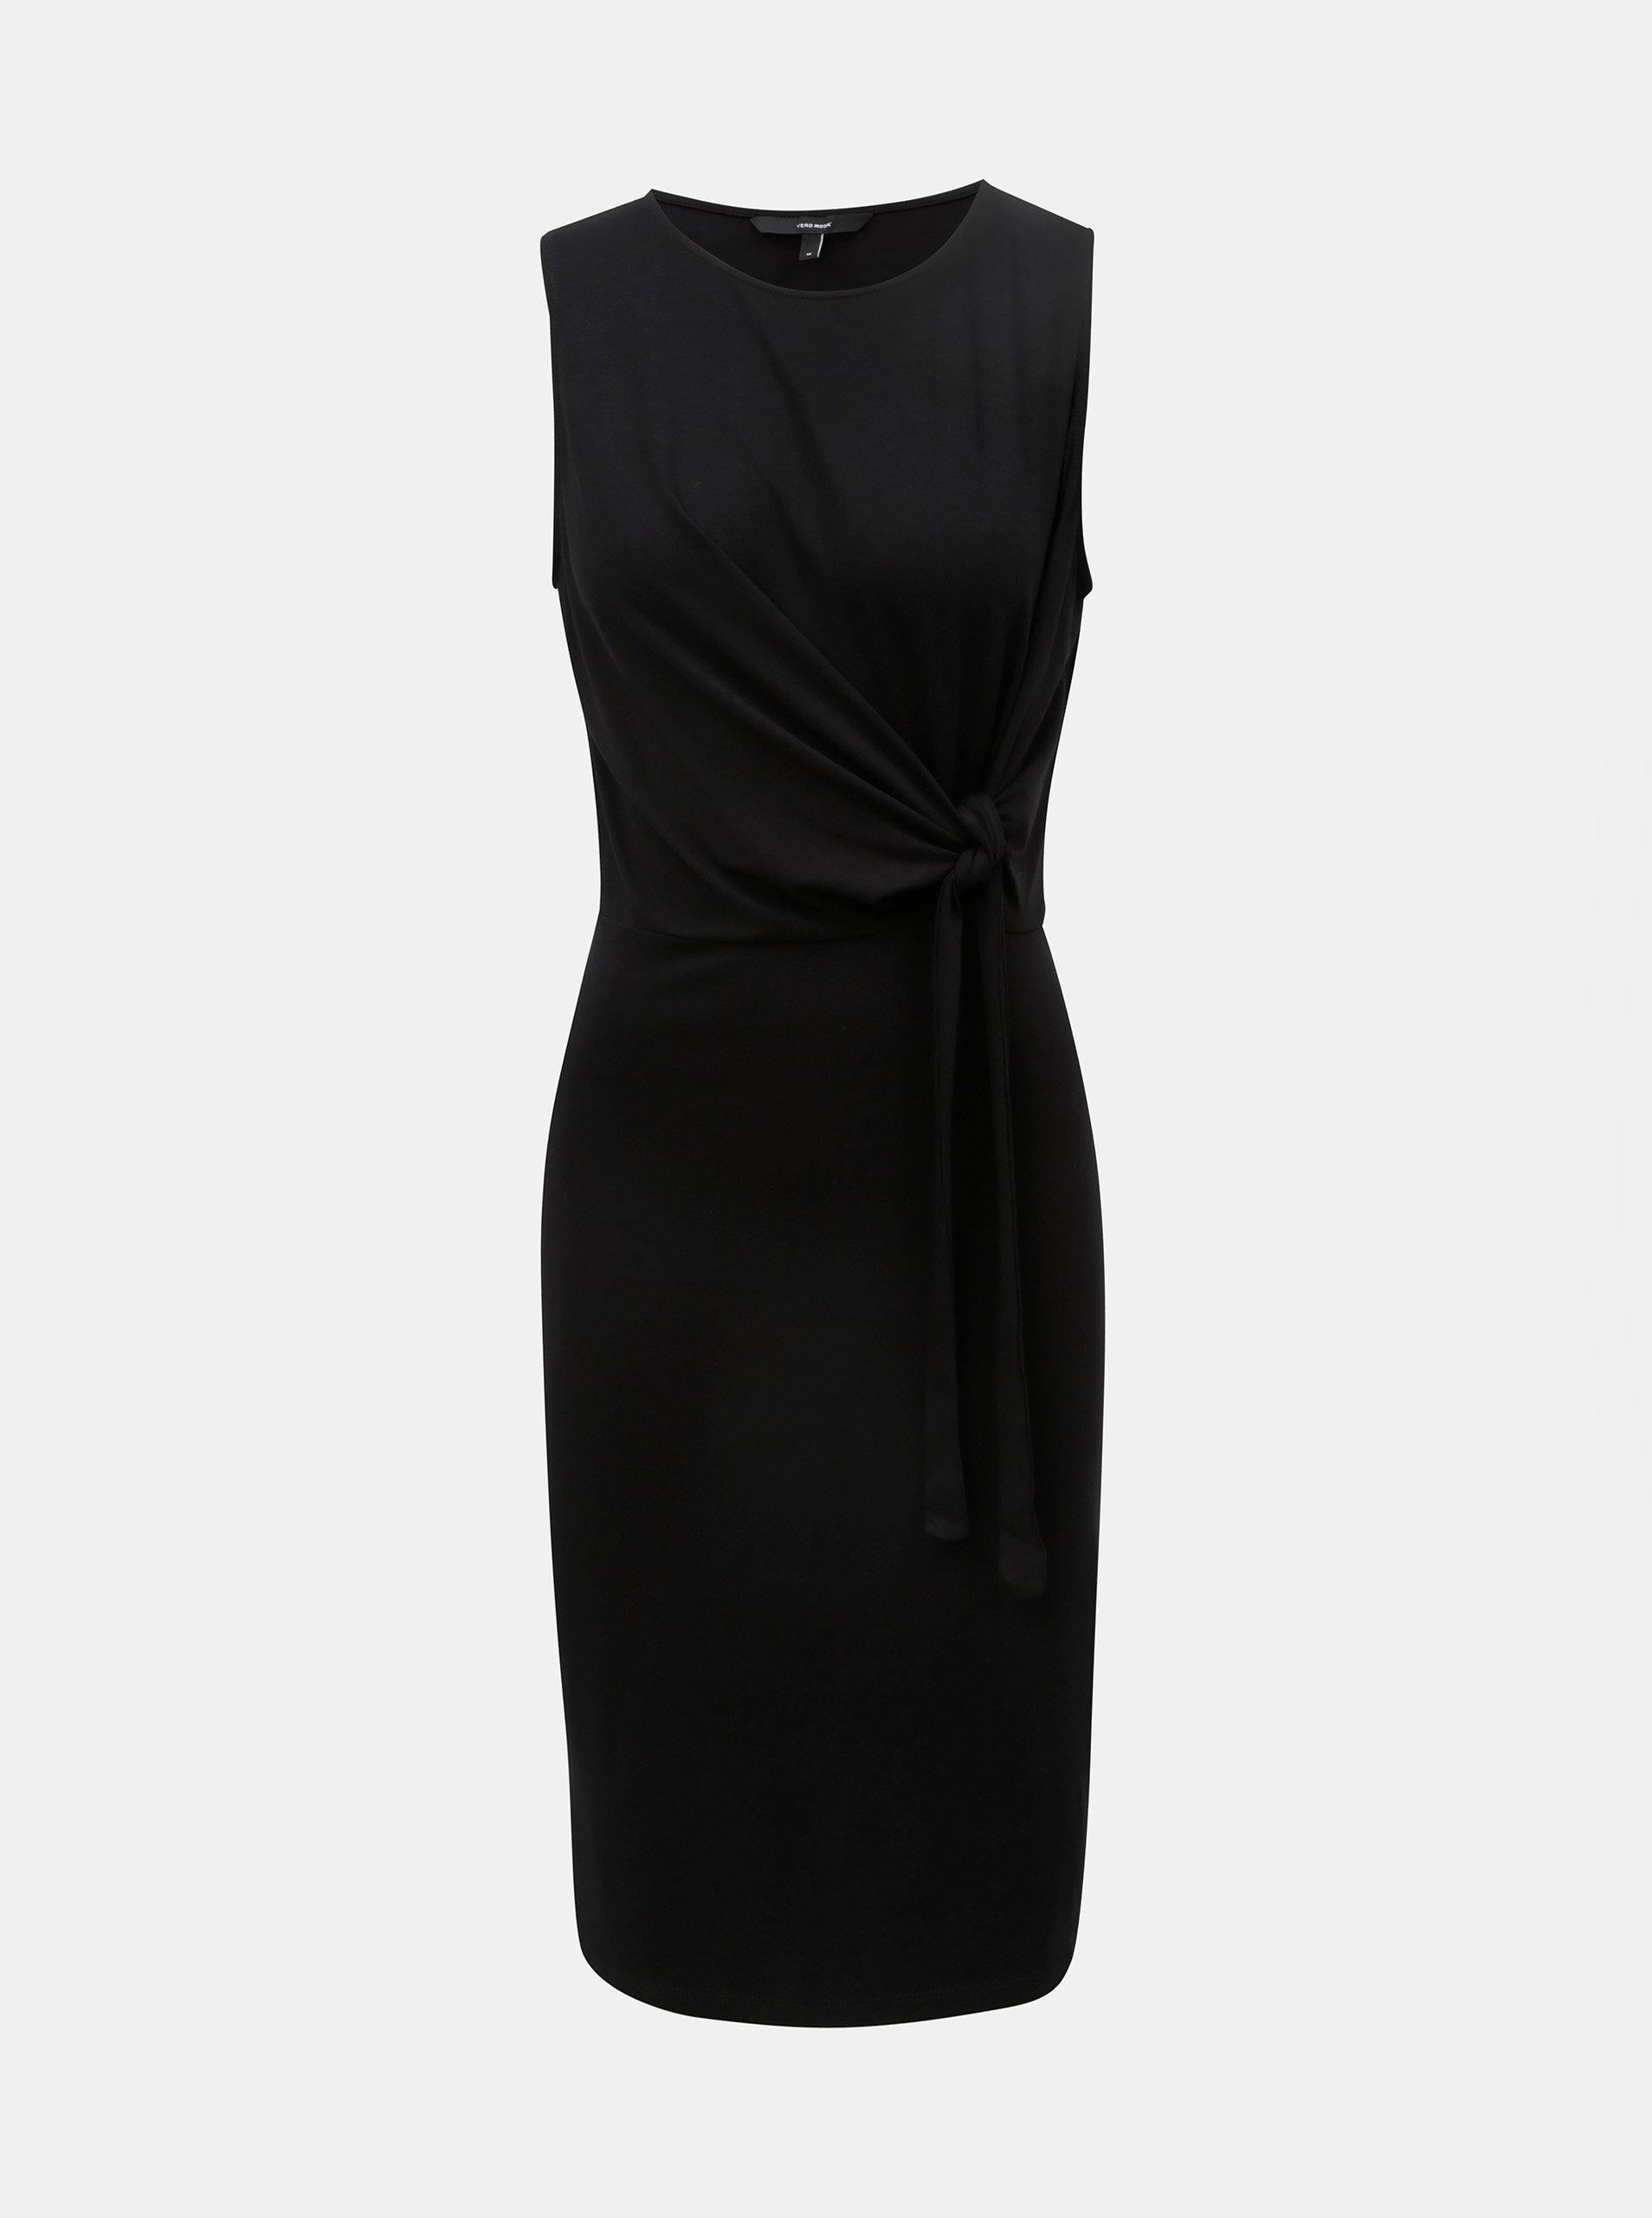 92ef61d7135 Černé šaty s uzlem VERO MODA Louisa ...